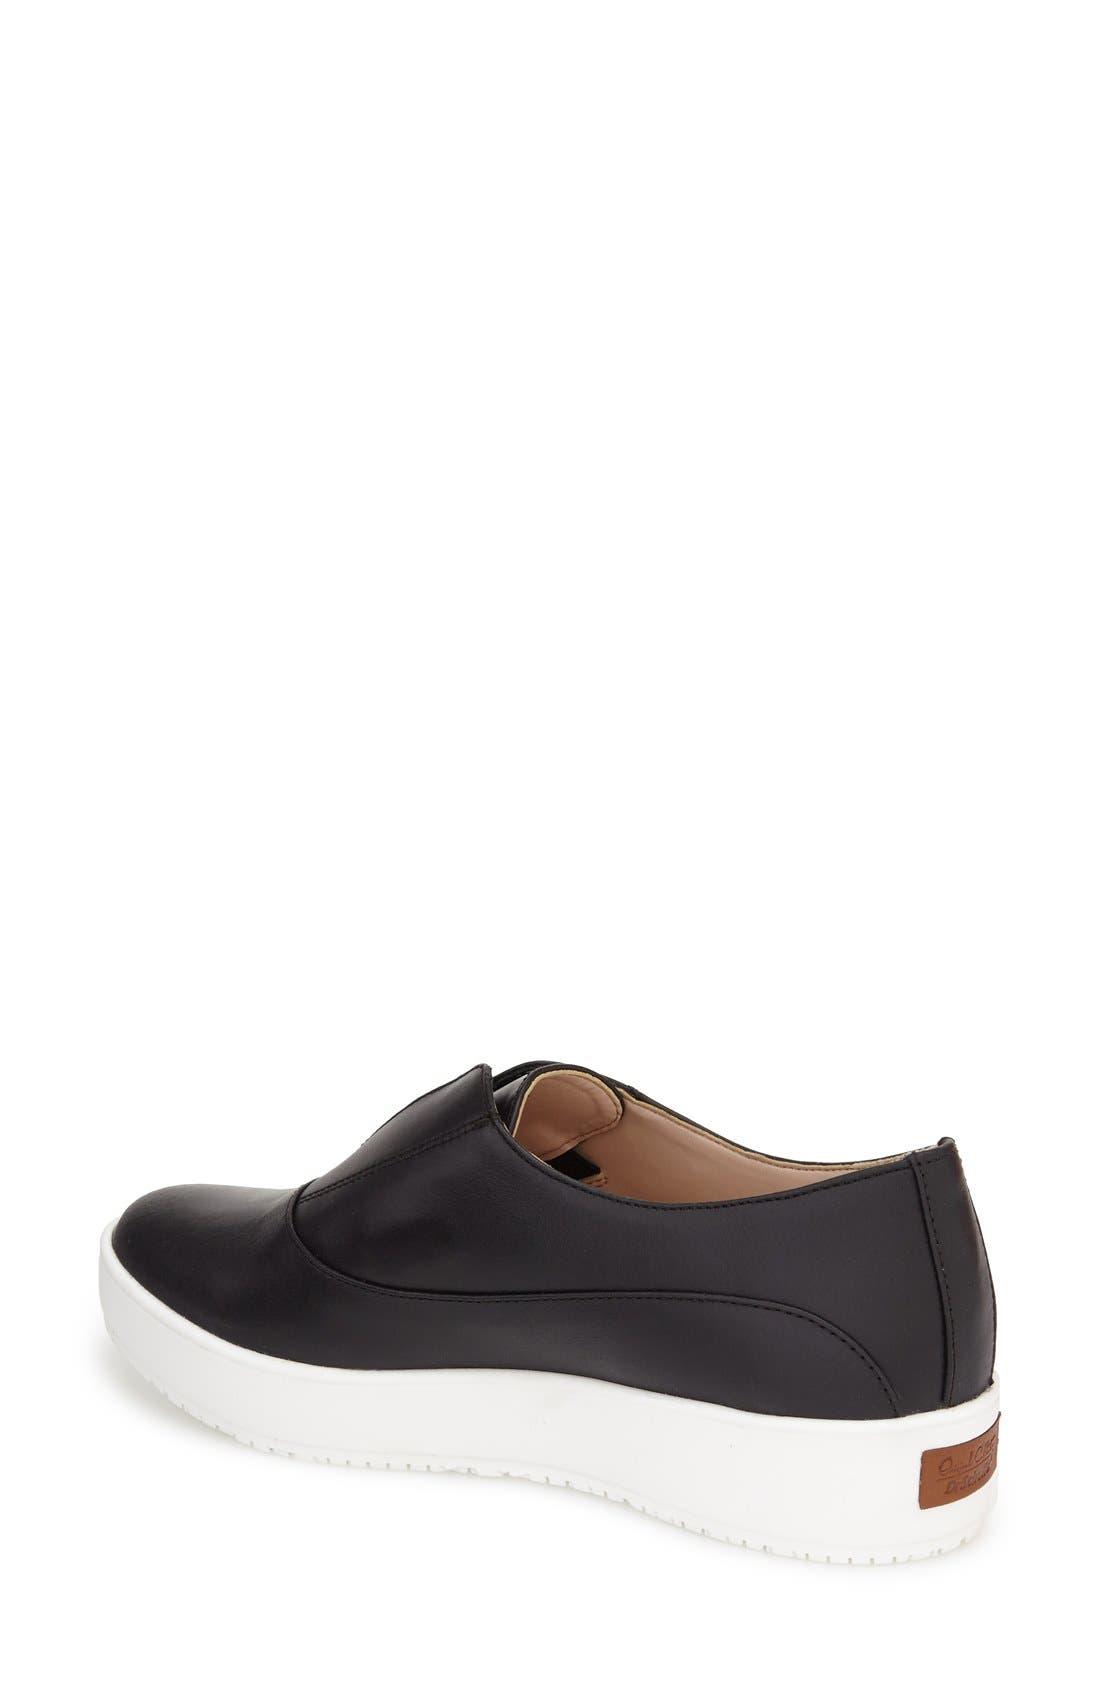 'Original Collection - Blakely' Laceless Platform Sneaker,                             Alternate thumbnail 2, color,                             001